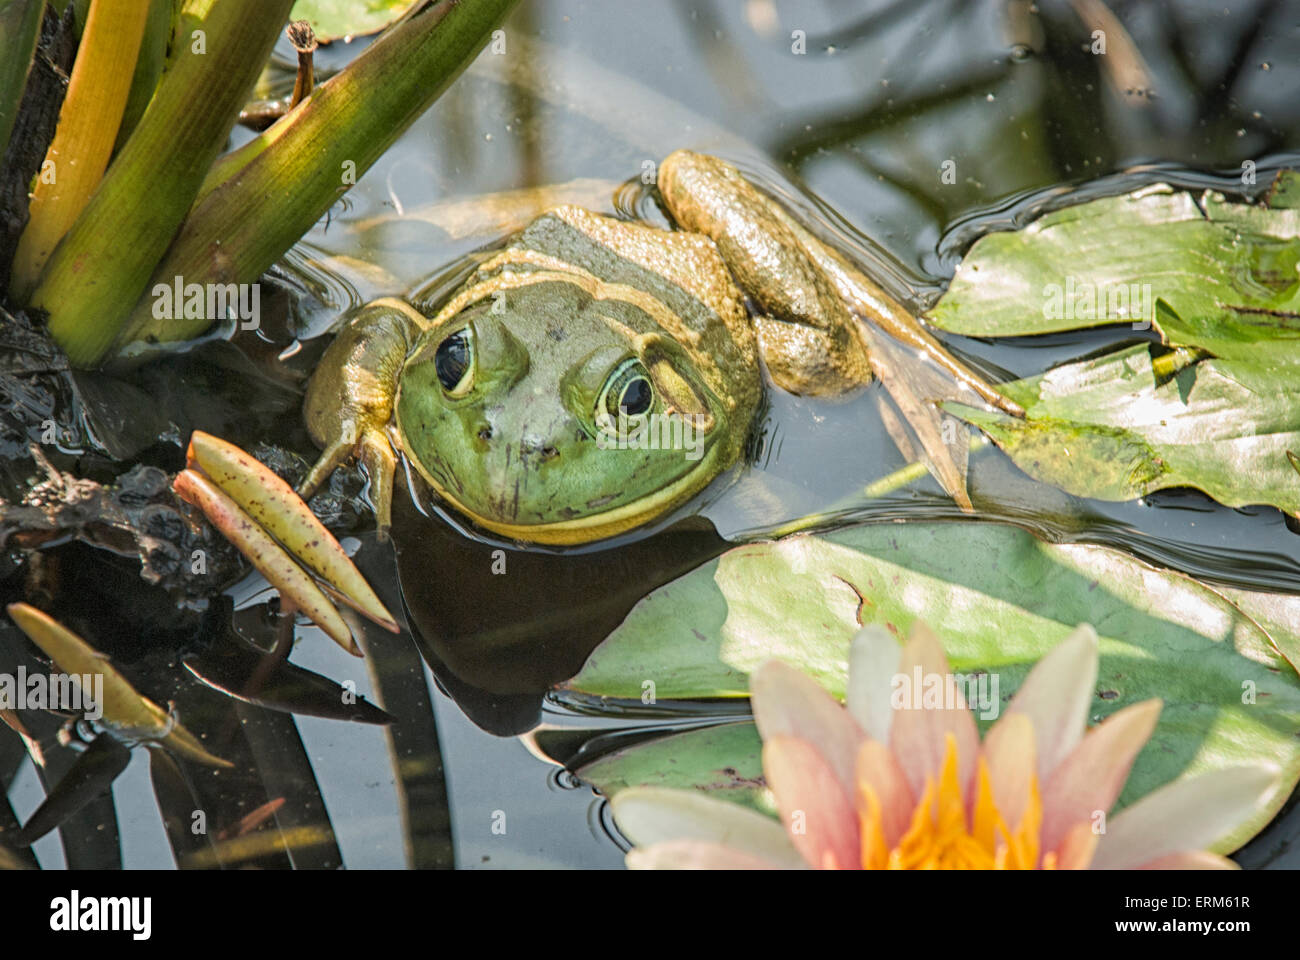 Lithobates catesbeianus American ouaouaron, Rana catesbeiana, ou dans un étang à New York State, USA Photo Stock